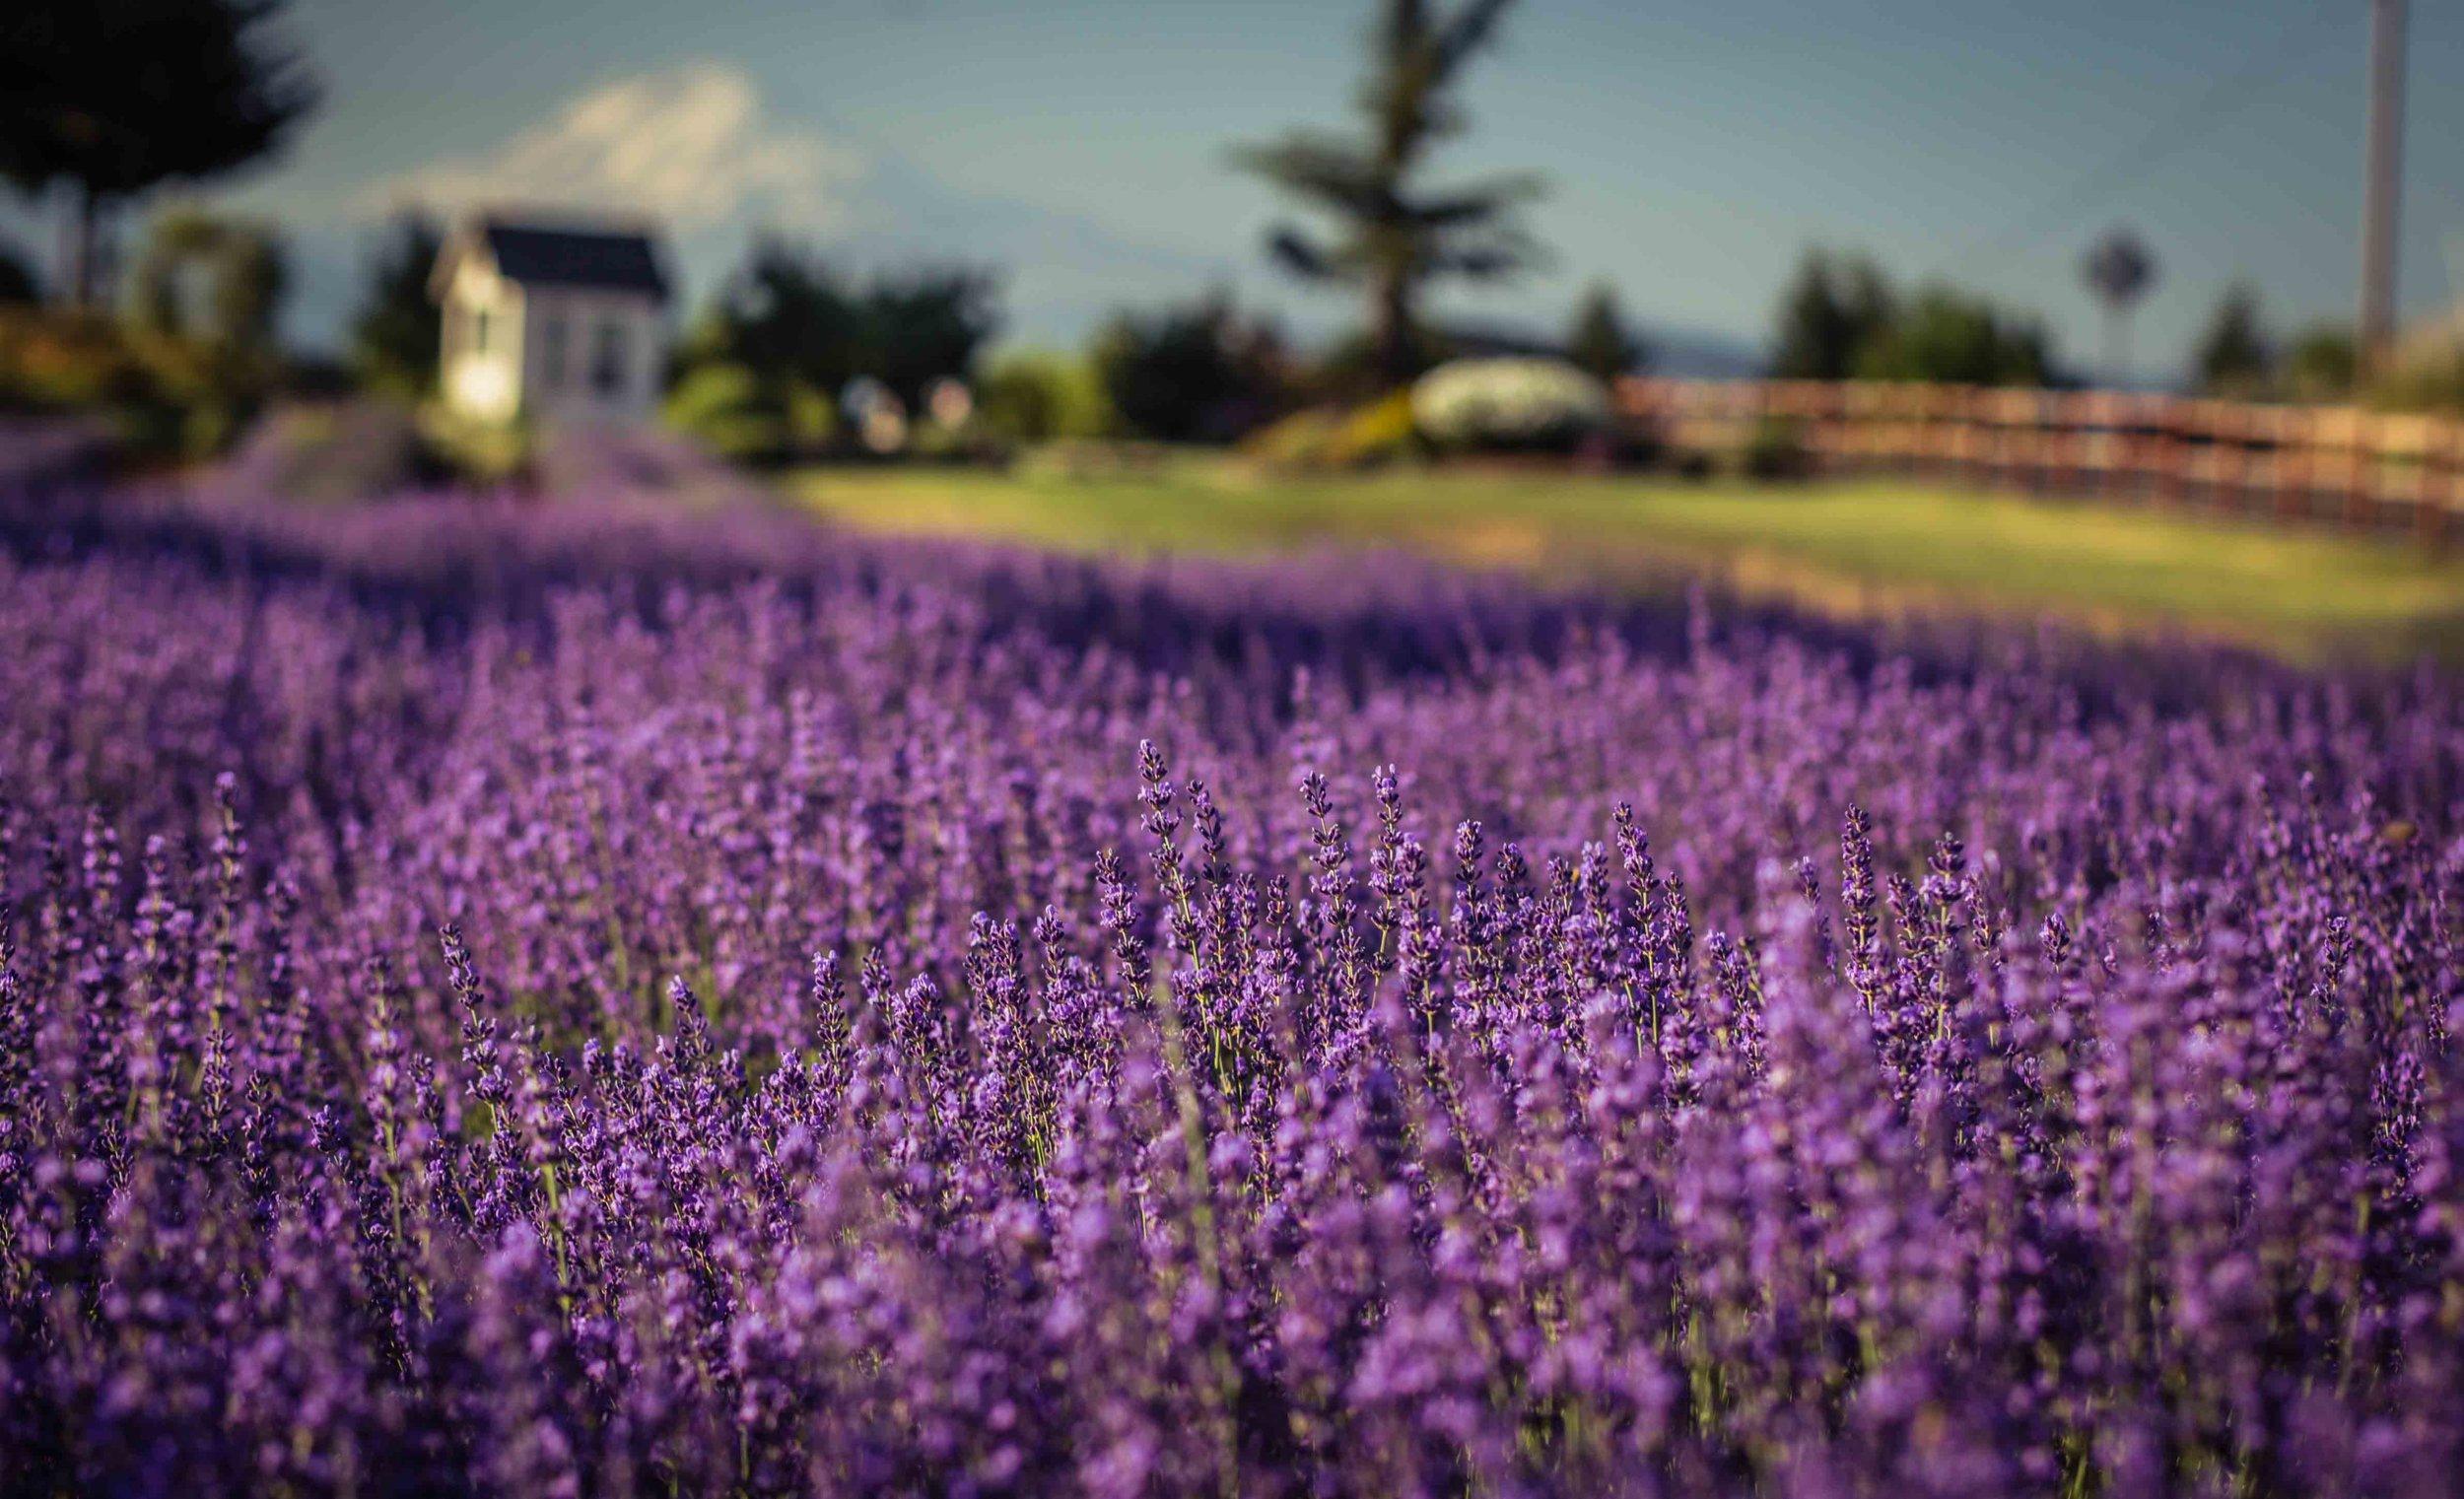 Hood River Lavender Farms Columbia Gorge buy lavender online hood river odell portland pacific northwest pnw creams lavender_-13.jpg